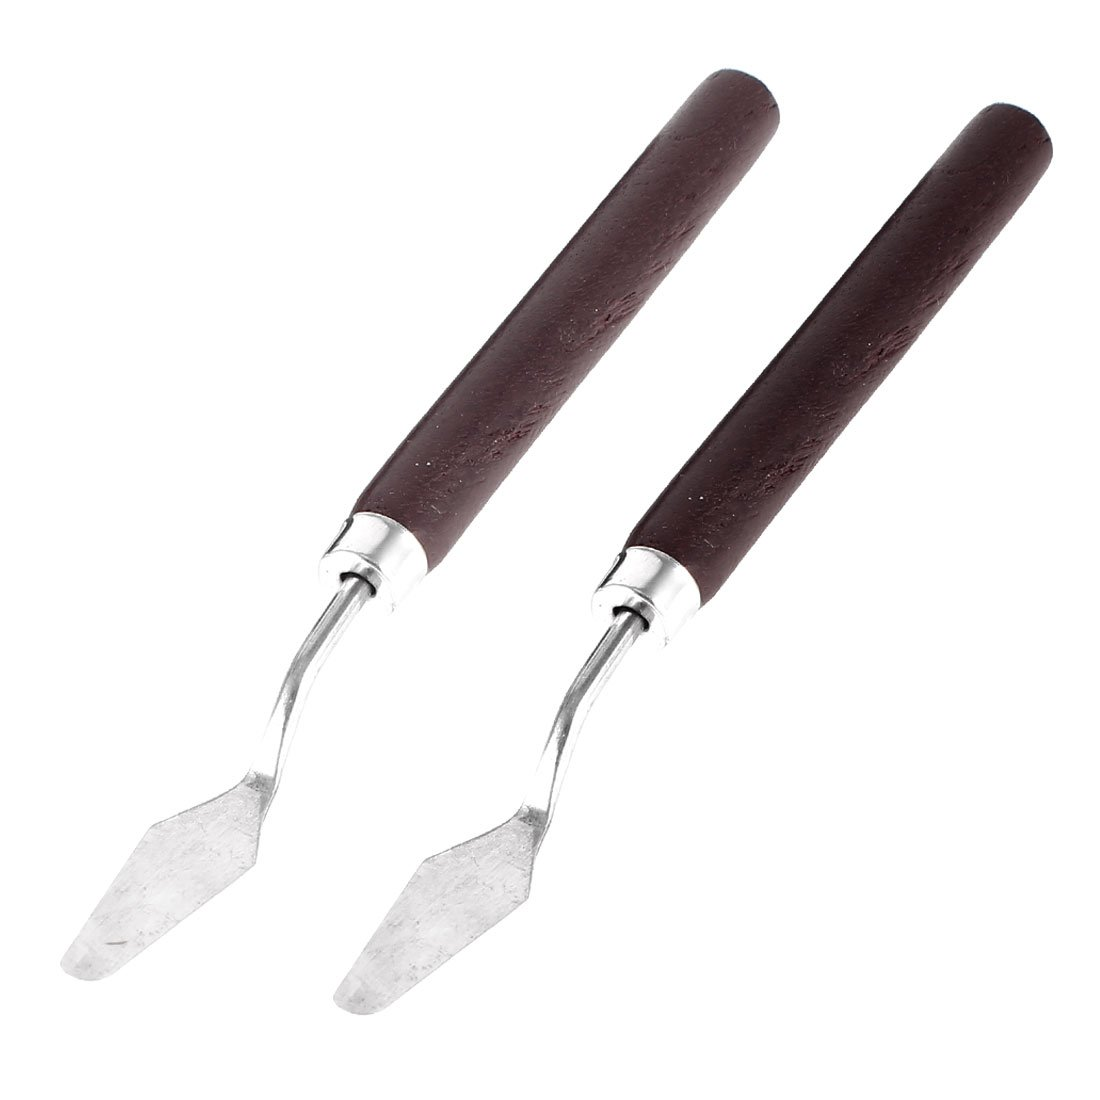 2pcs Wooden Grip Metal Blade Palette Art Painting Spatula Scraper 6.3 uxcell 4336973590